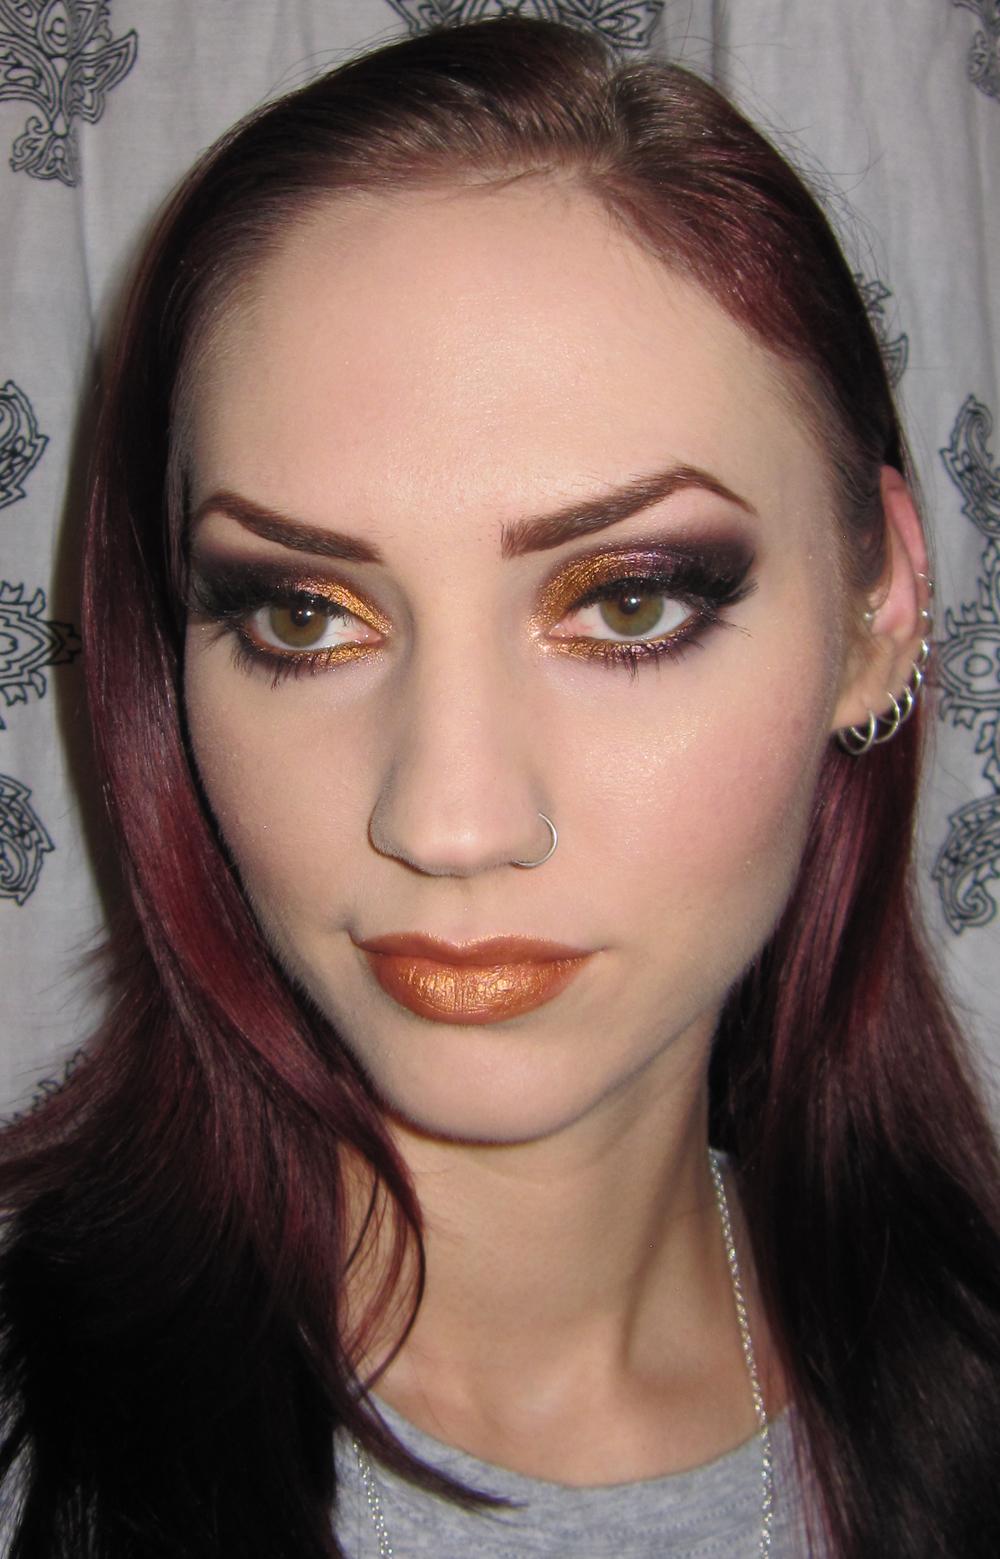 ... Faerie Makeup Tutorial Images Tutorial Application Form; Fairy ...